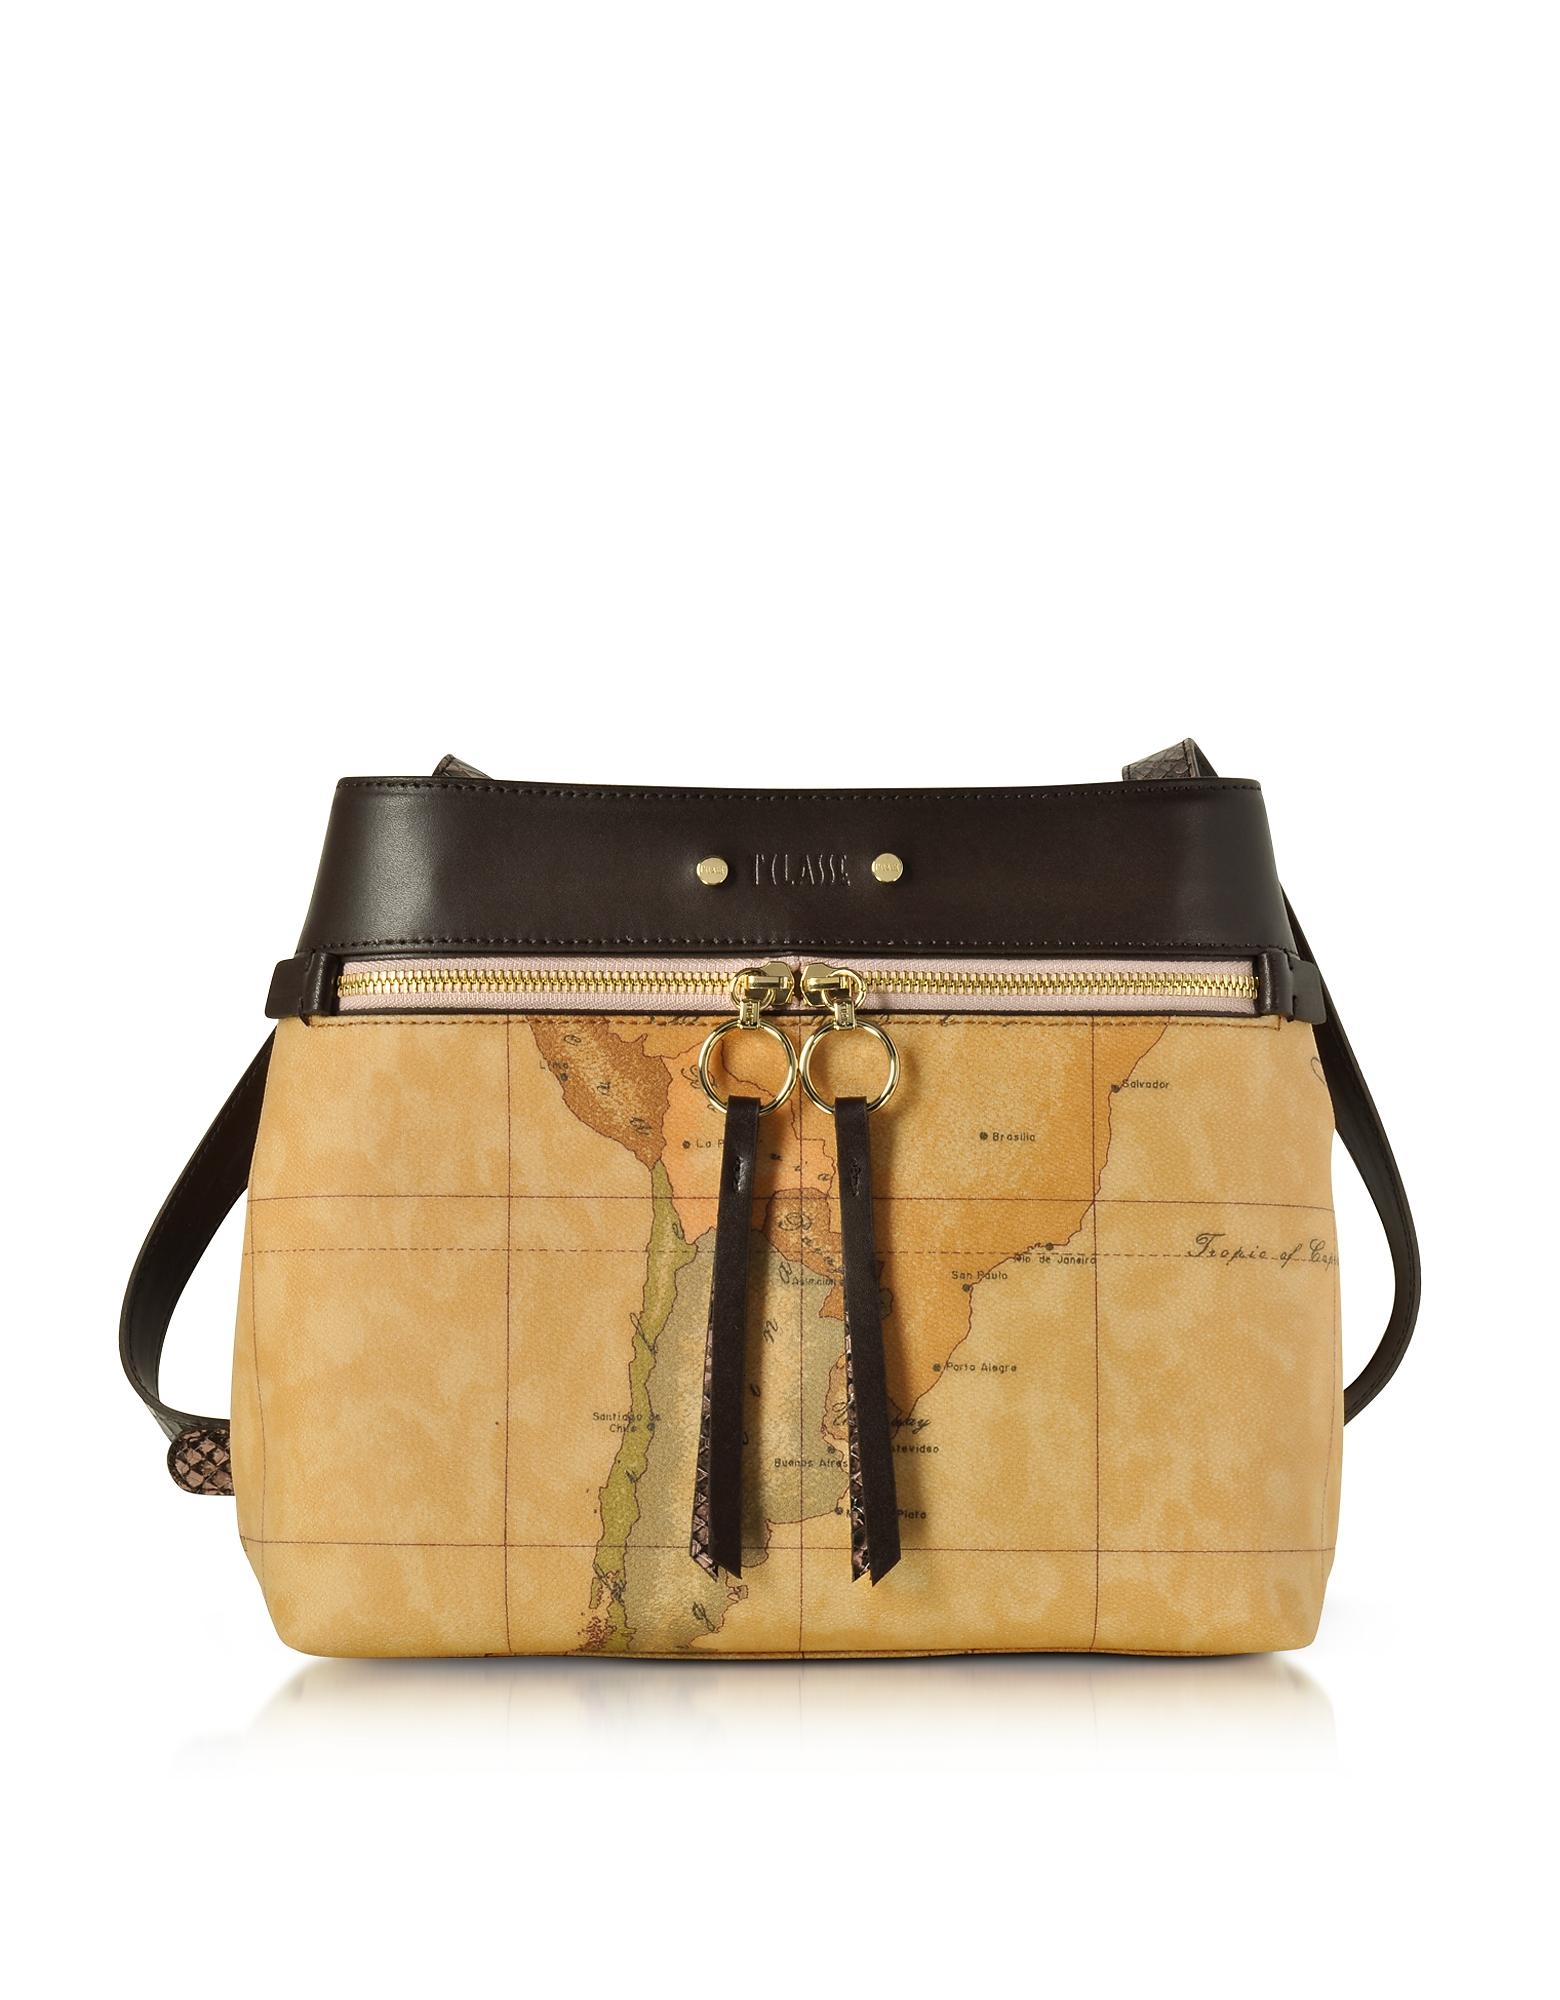 Alviero Martini 1A Classe Handbags, Vanity Dark Brown Leather Shoulder Bag